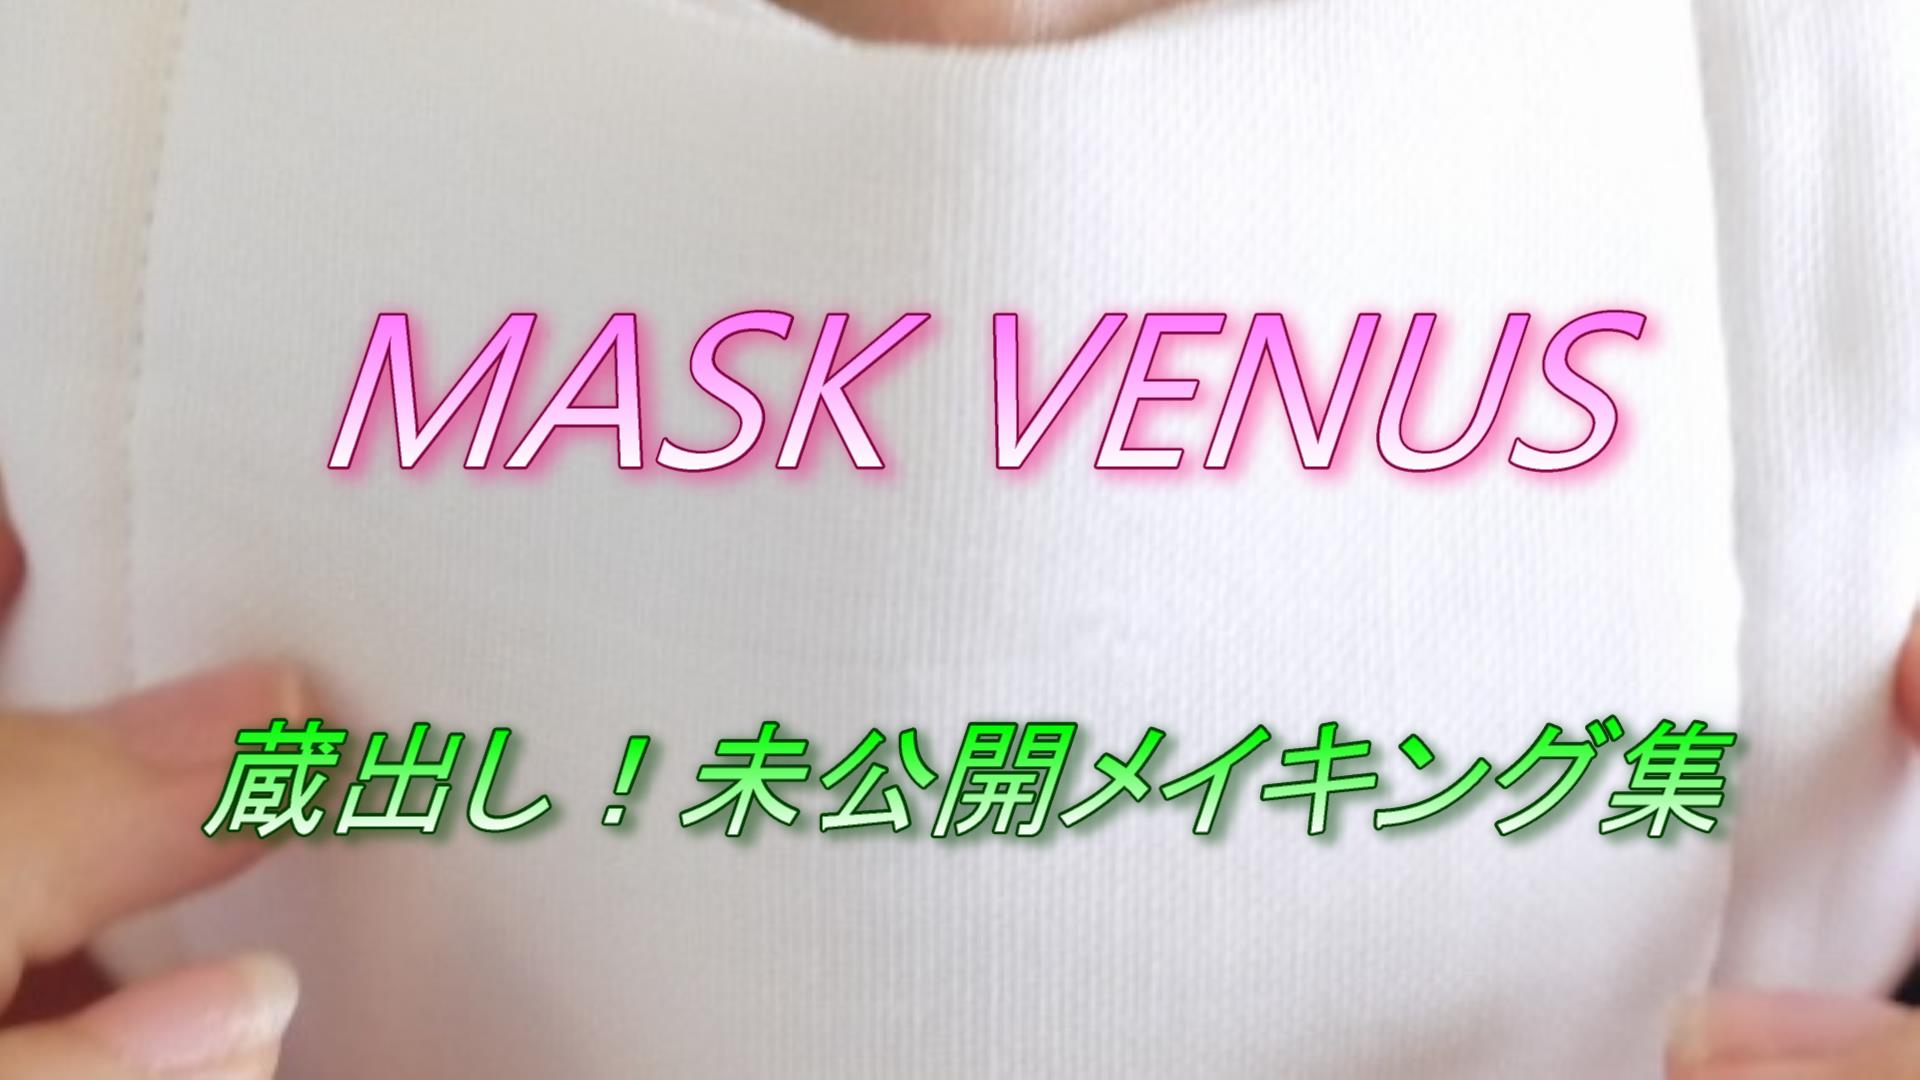 MASK VENUS 蔵出し!未公開メイキング集 border=